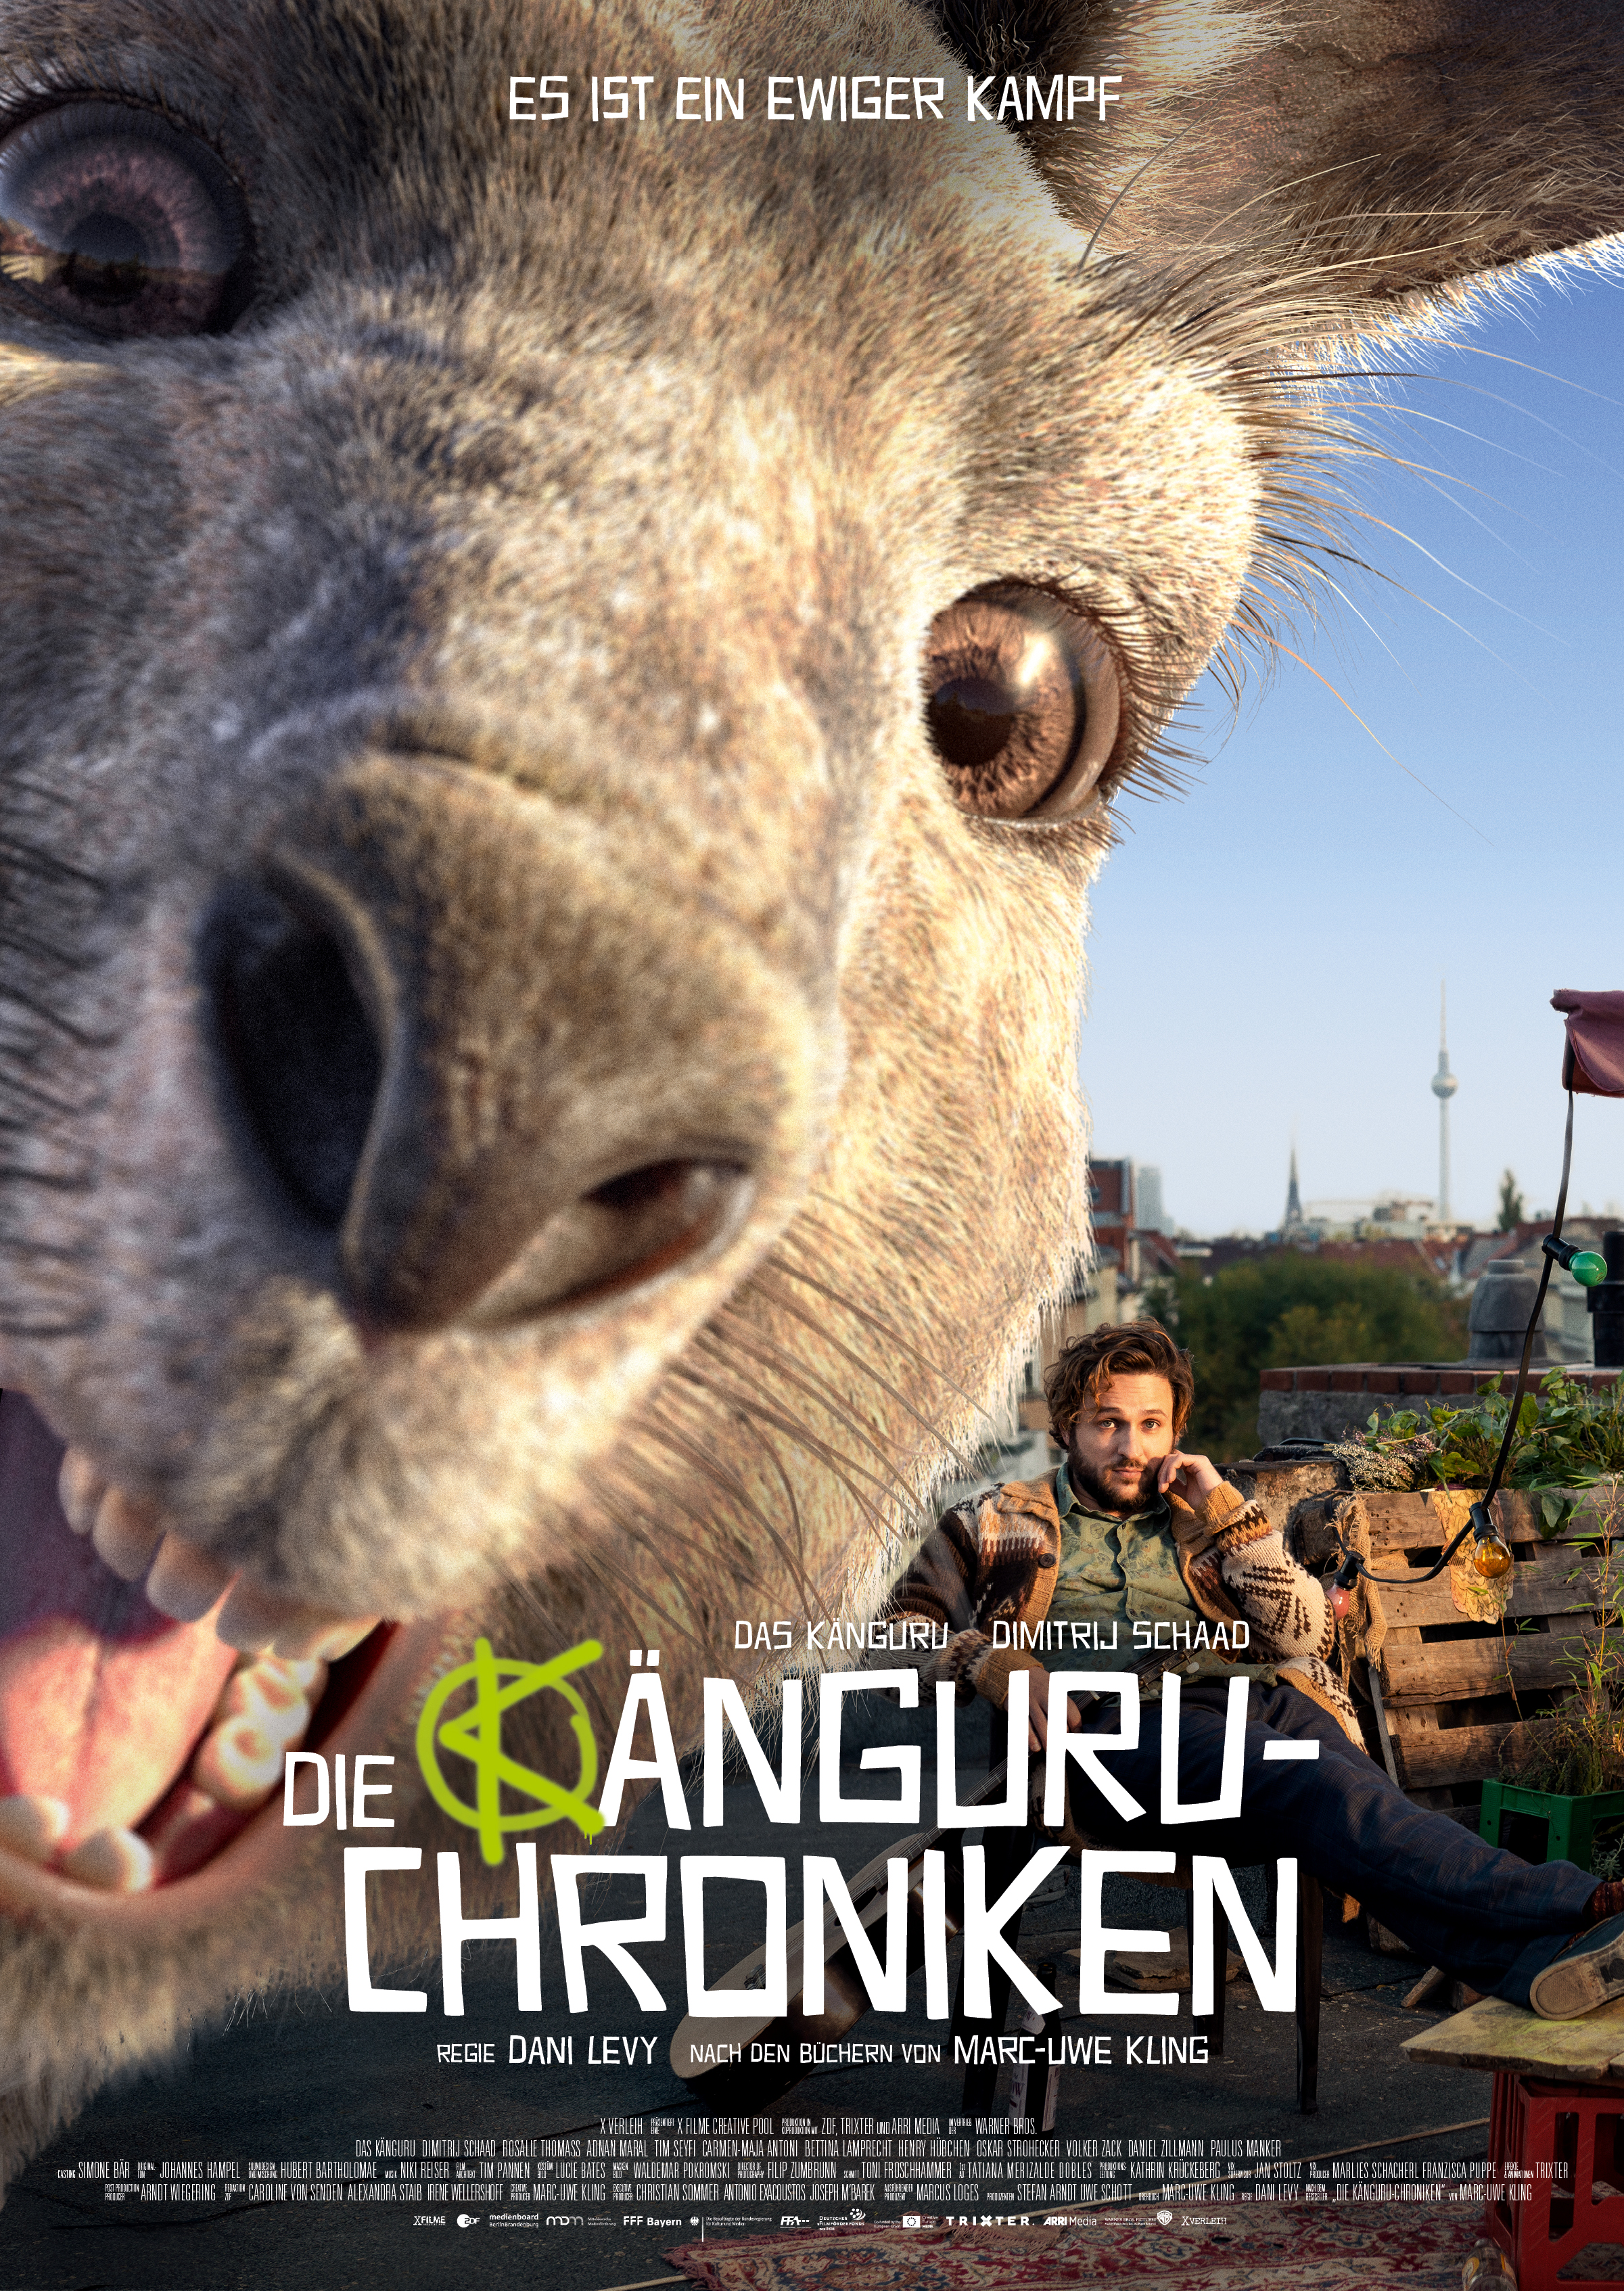 Die-Kaenguru-Chroniken-Poster-2020